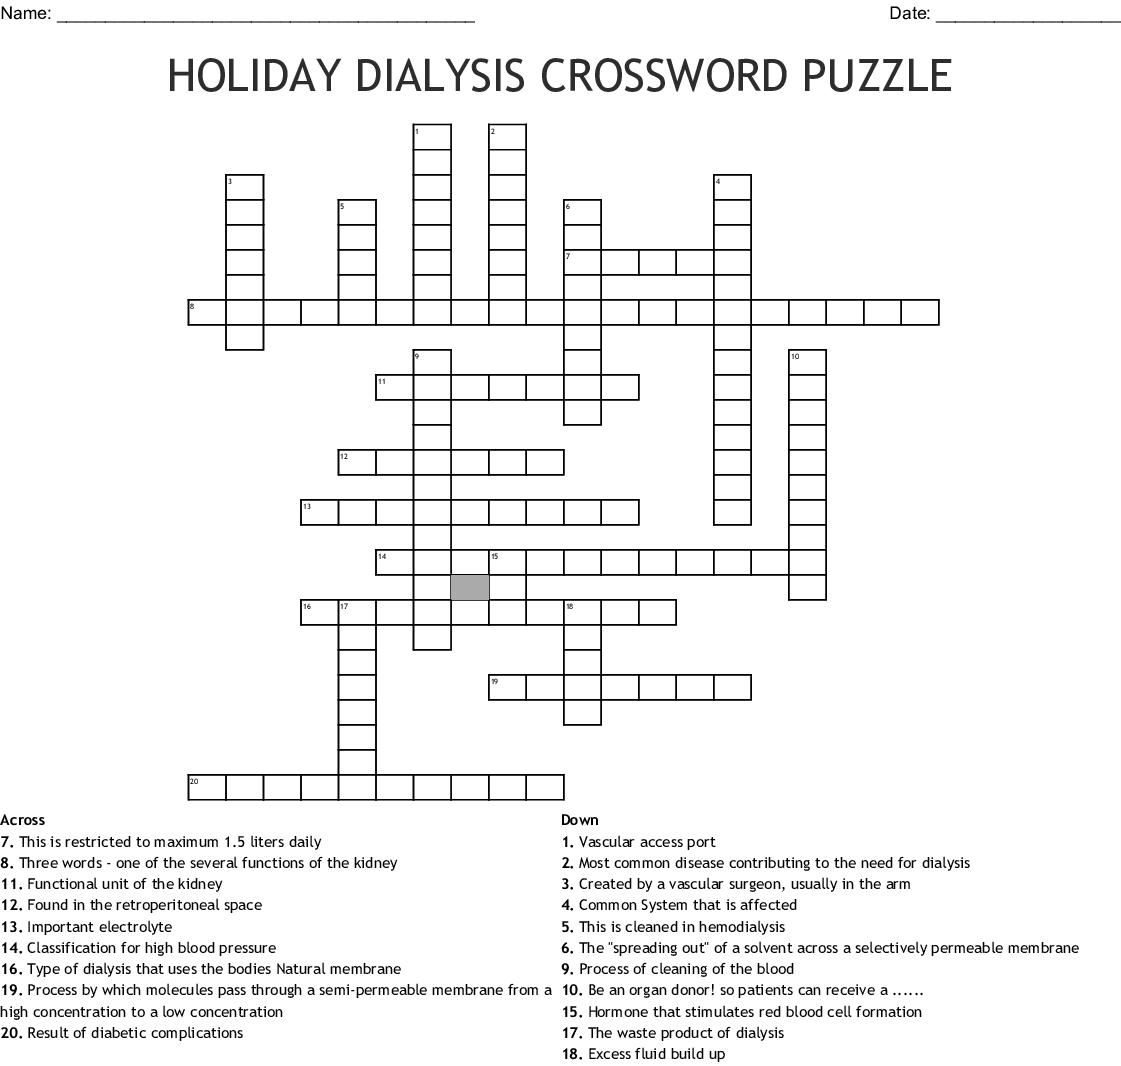 HOLIDAY DIALYSIS CROSSWORD PUZZLE - WordMint